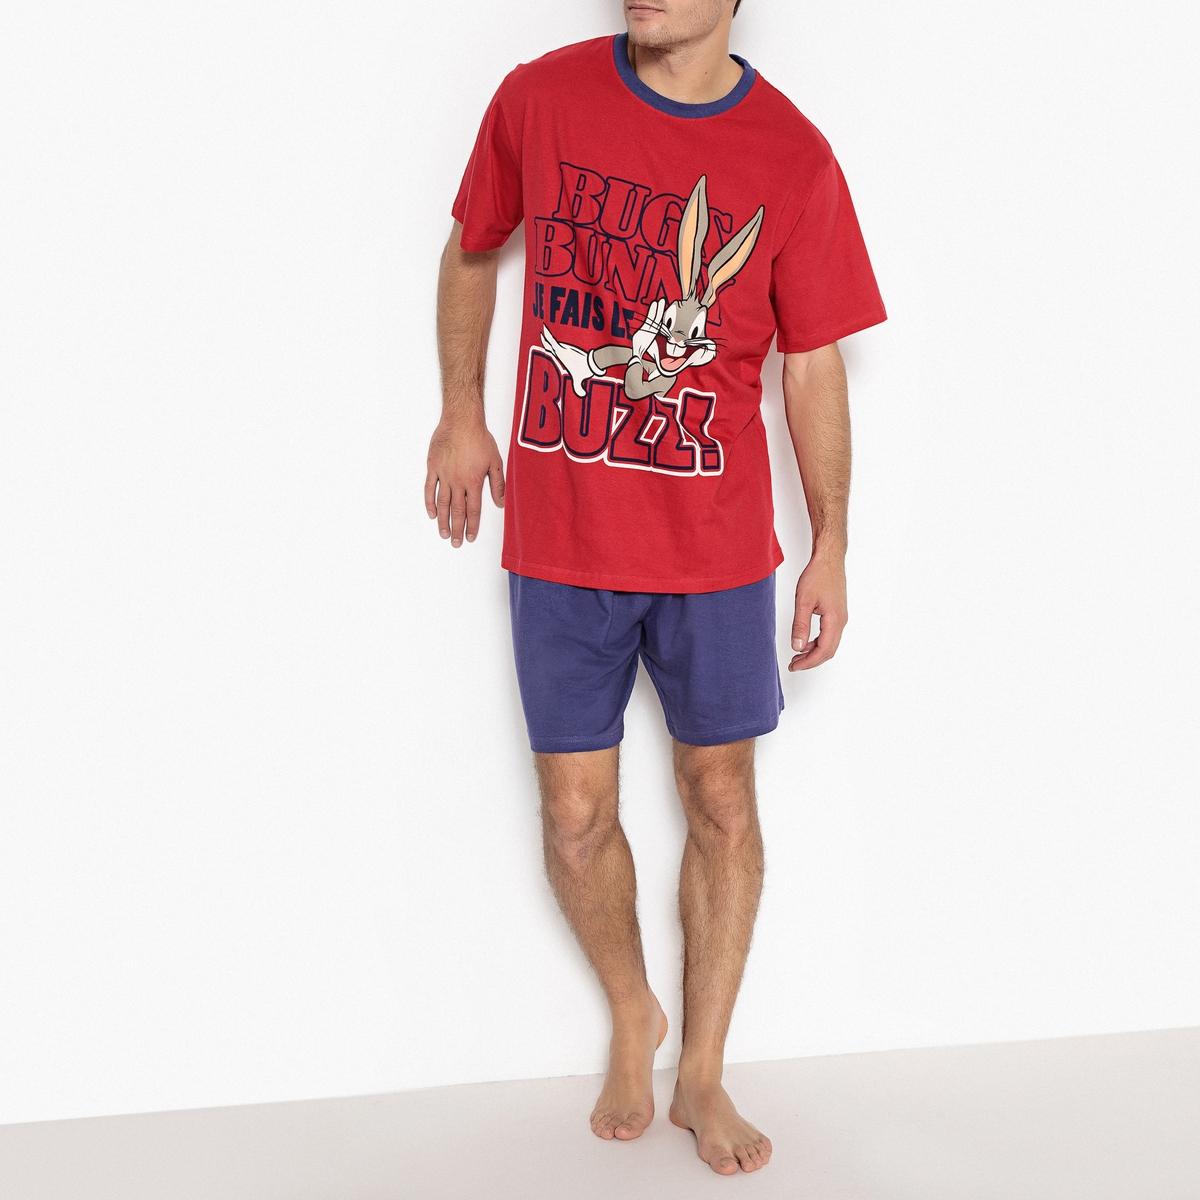 Пижама с шортами, короткие рукава и рисунок пижама с шортами nici